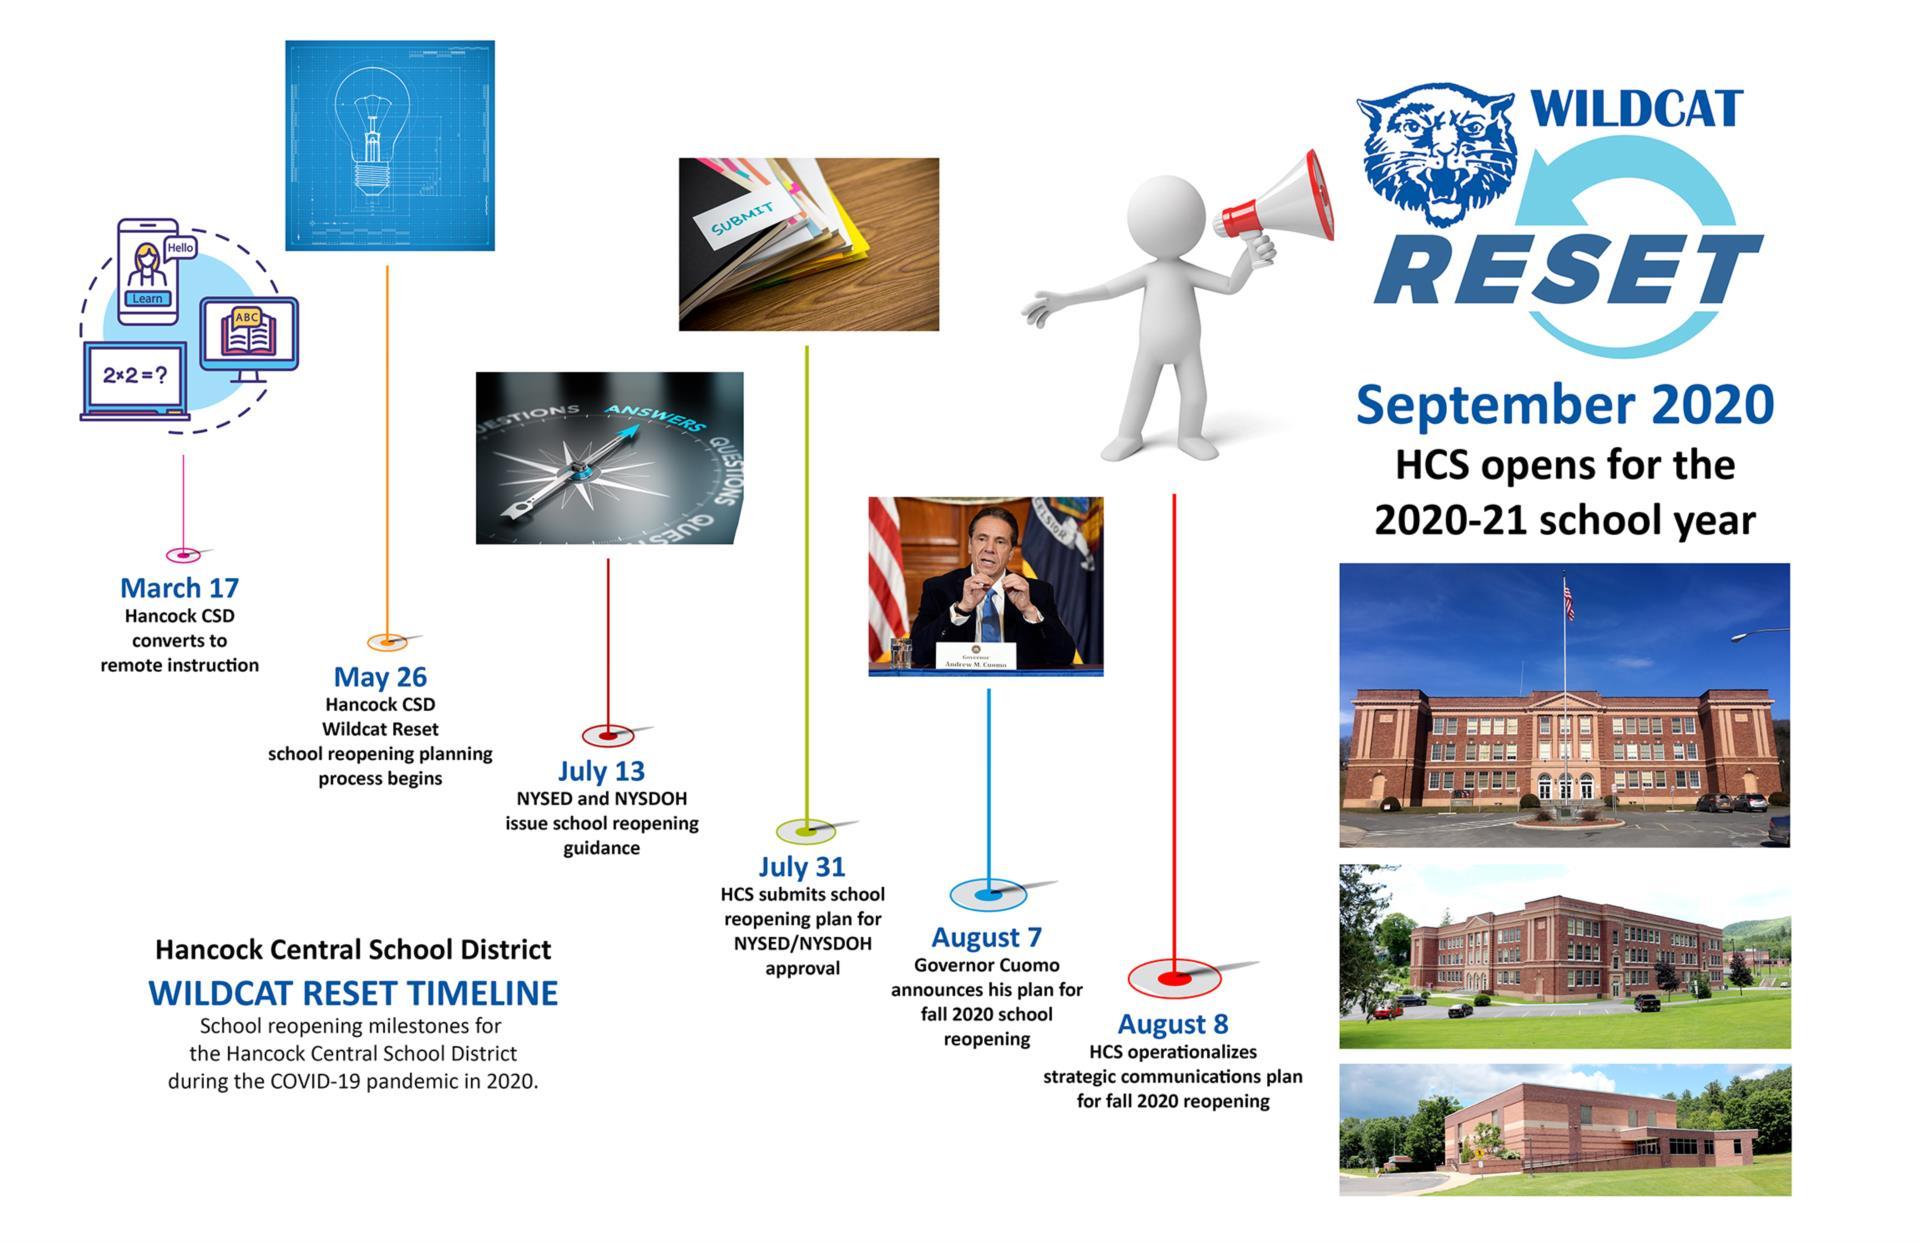 Wildcat Reset 2020 Timeline infographic image (7/2020)